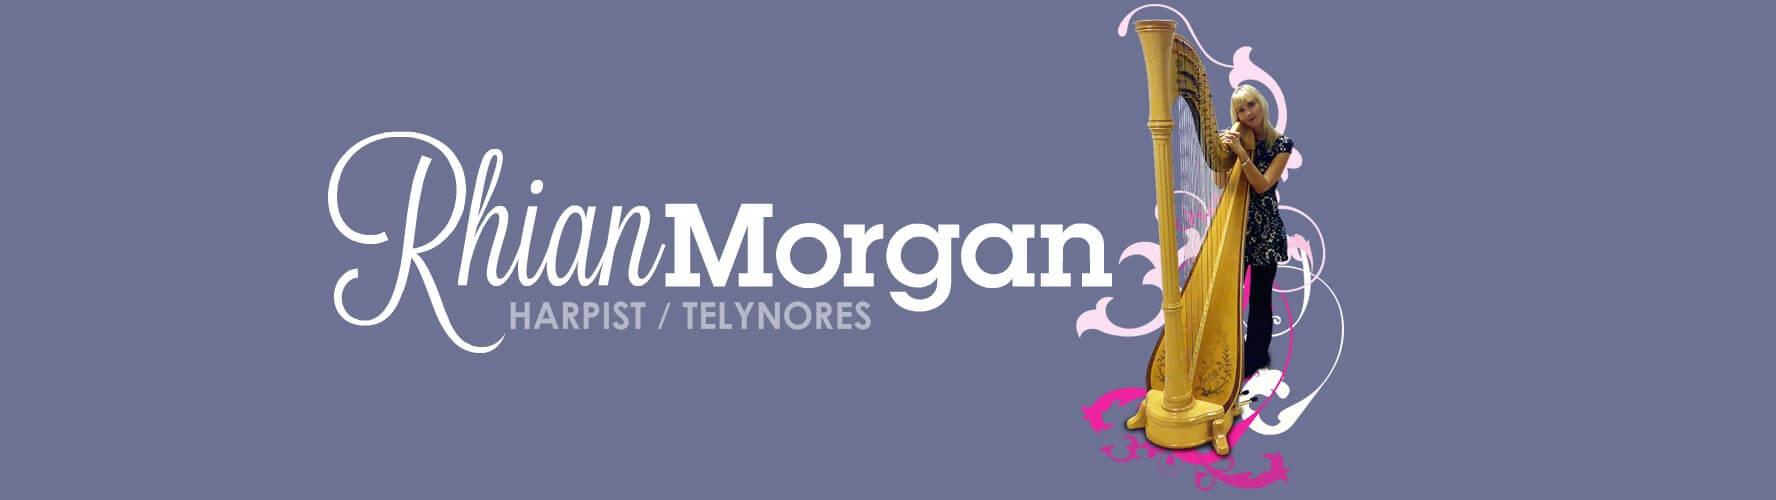 Rhian Morgan Harpist